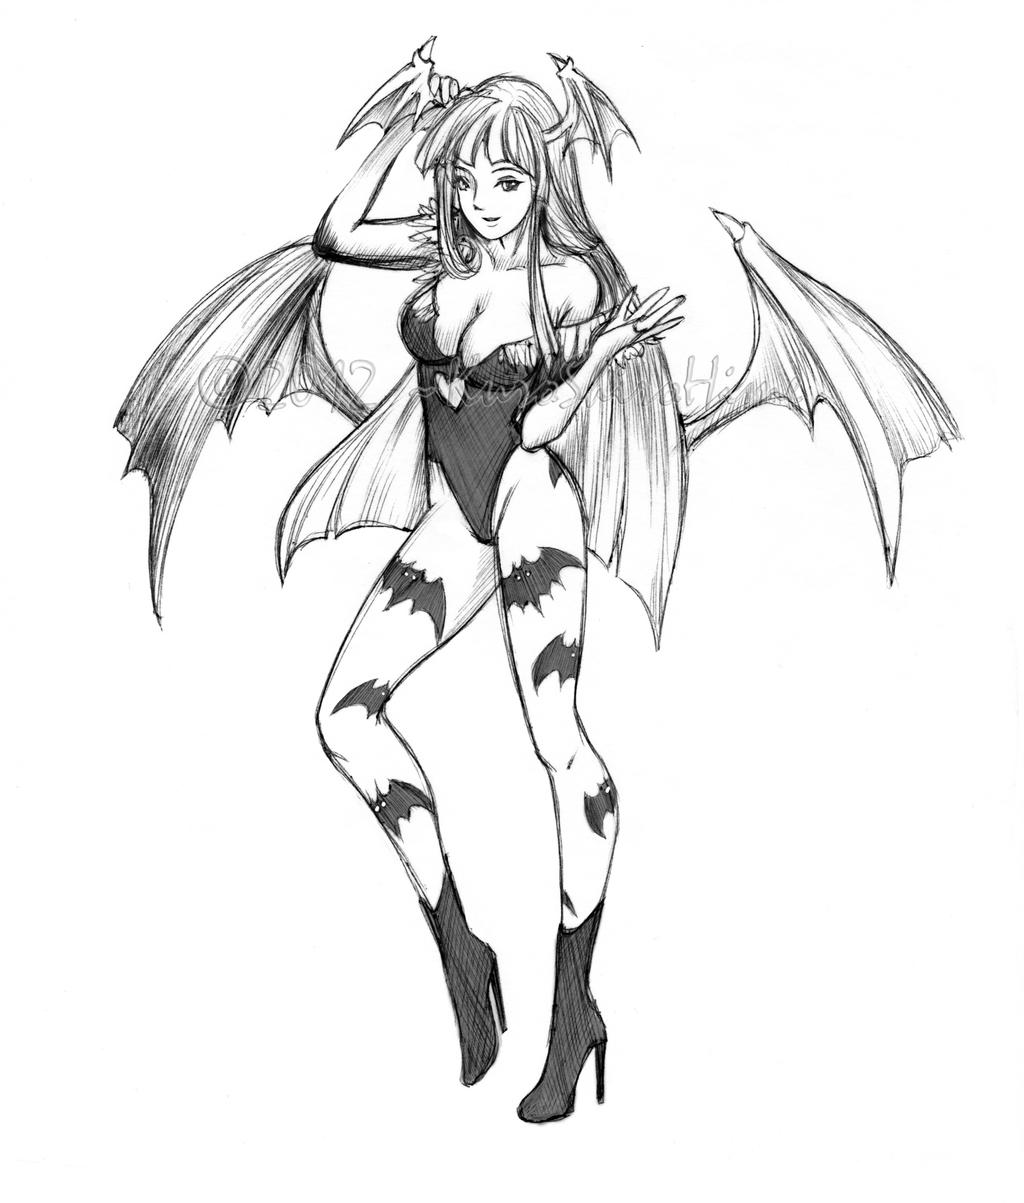 Morrigan Night Warrior Princess by KuroShiroHime